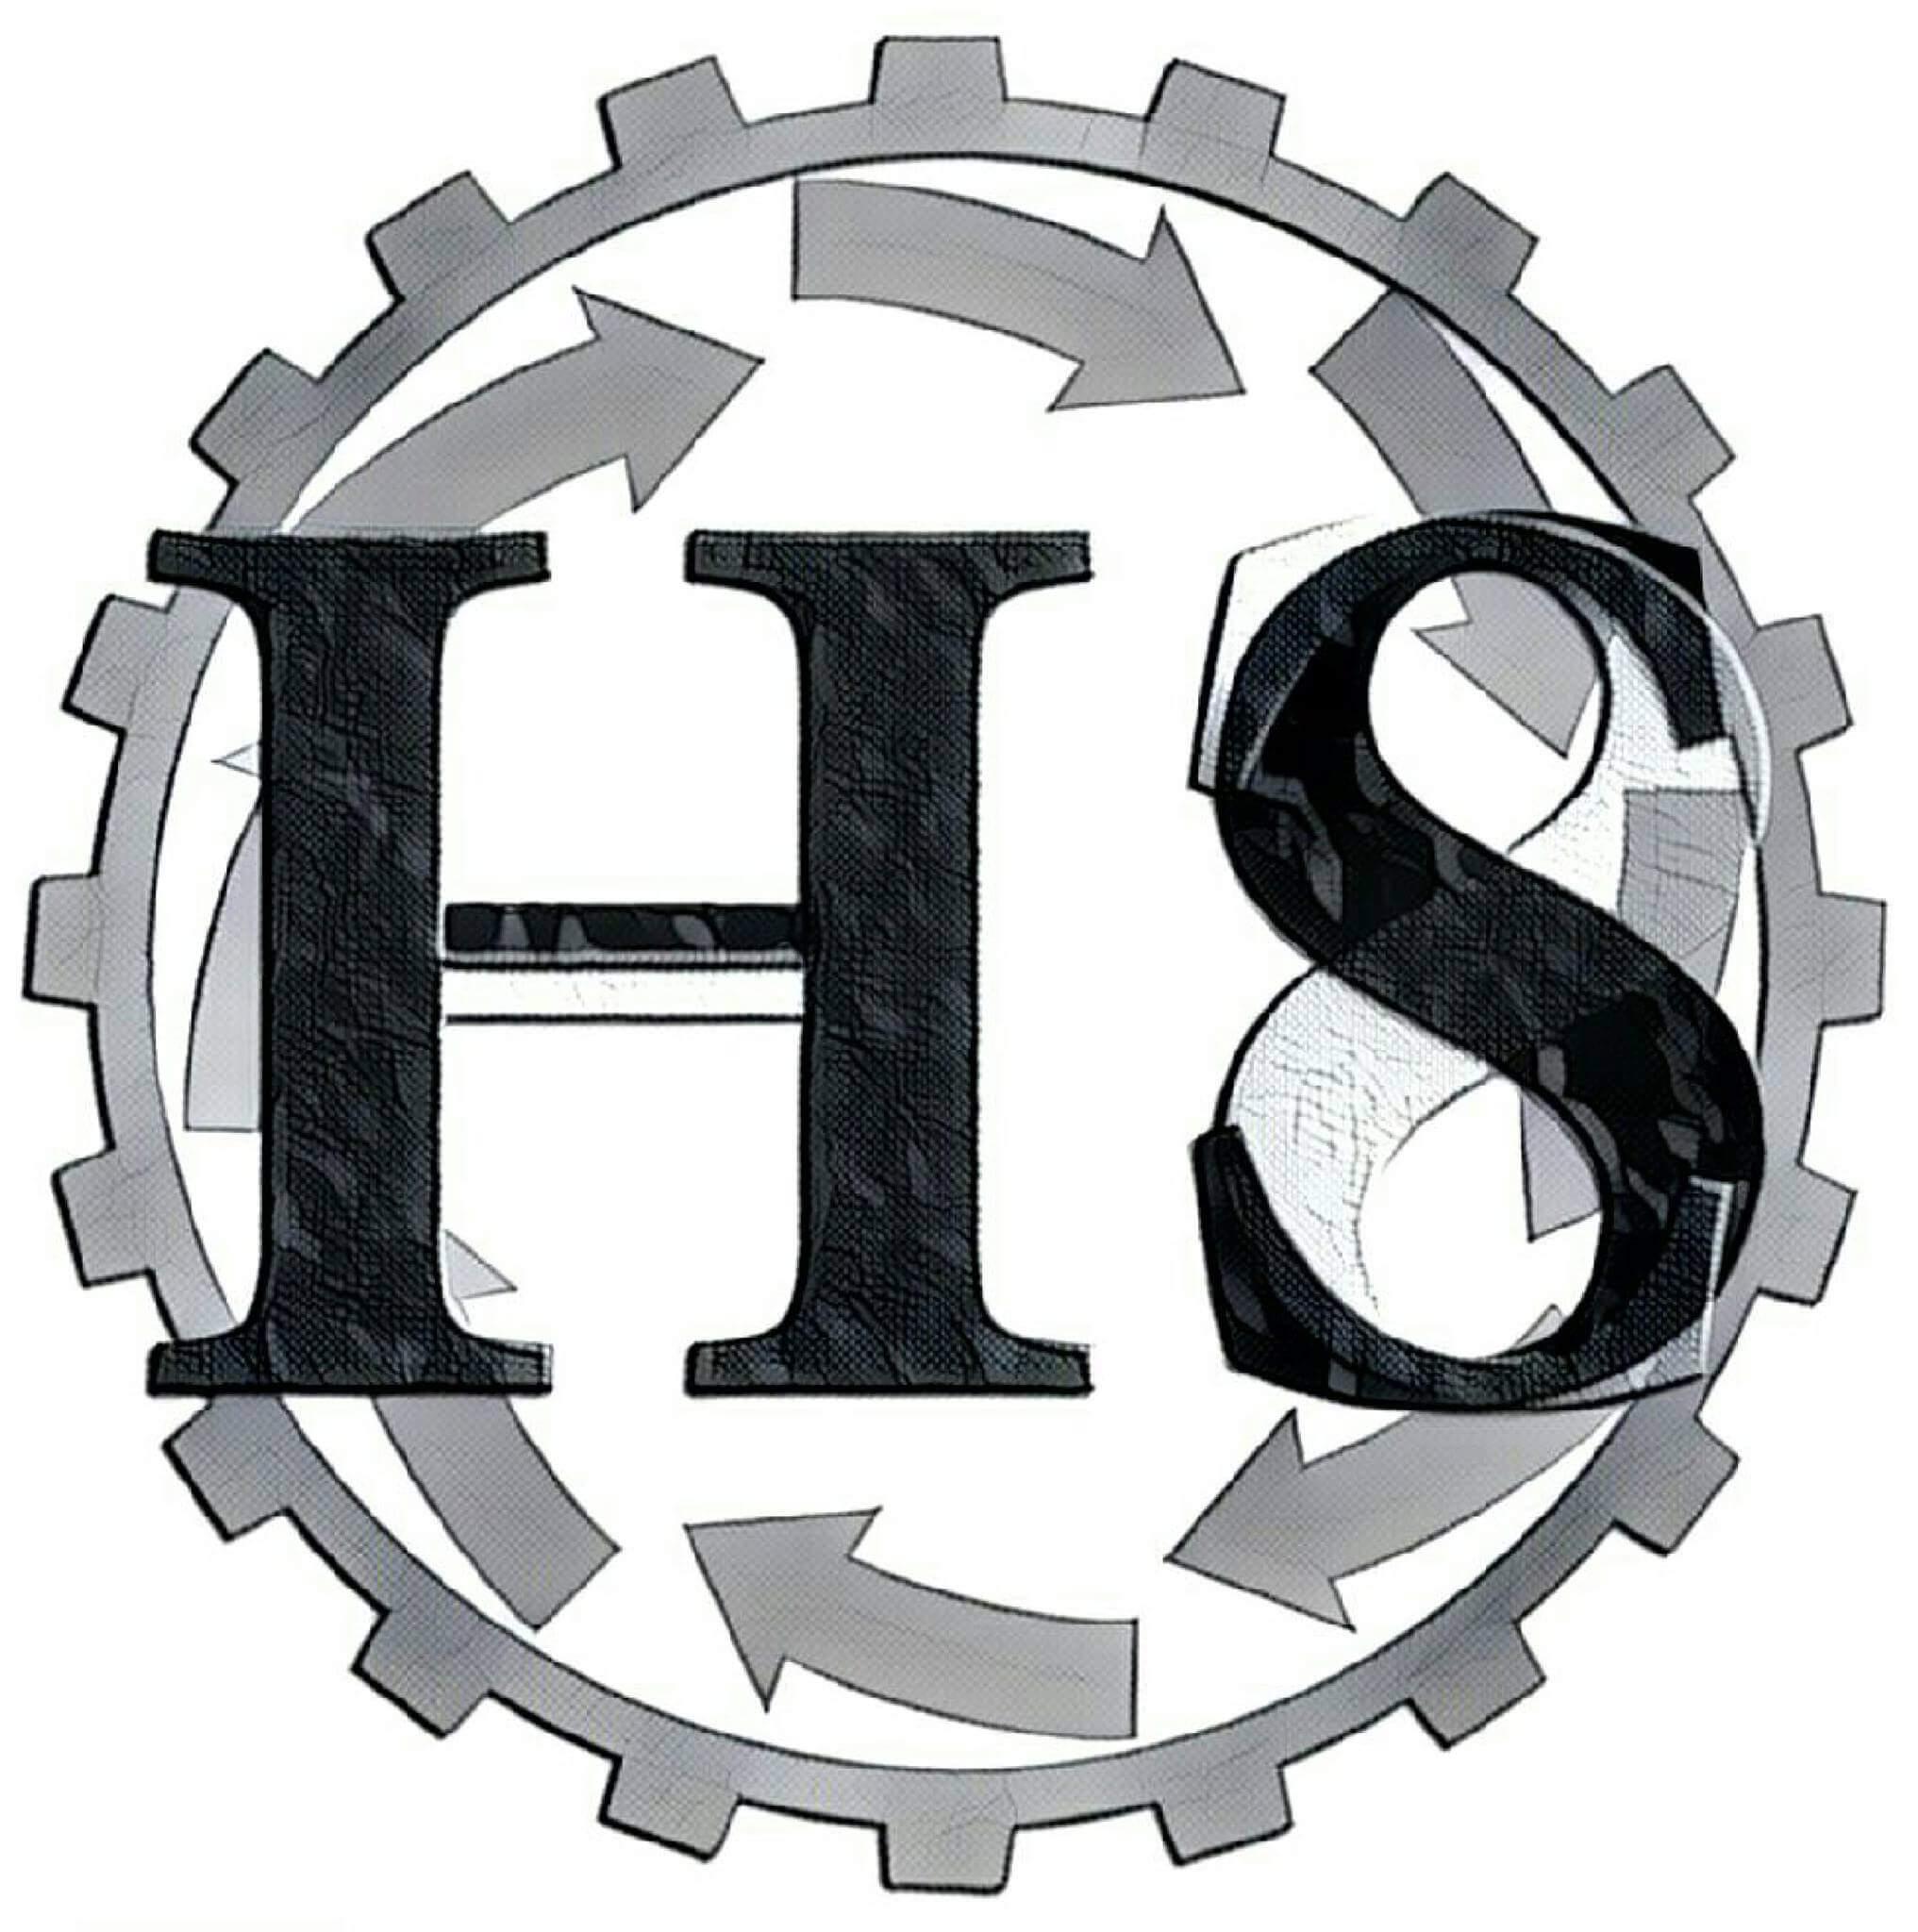 hacking_social